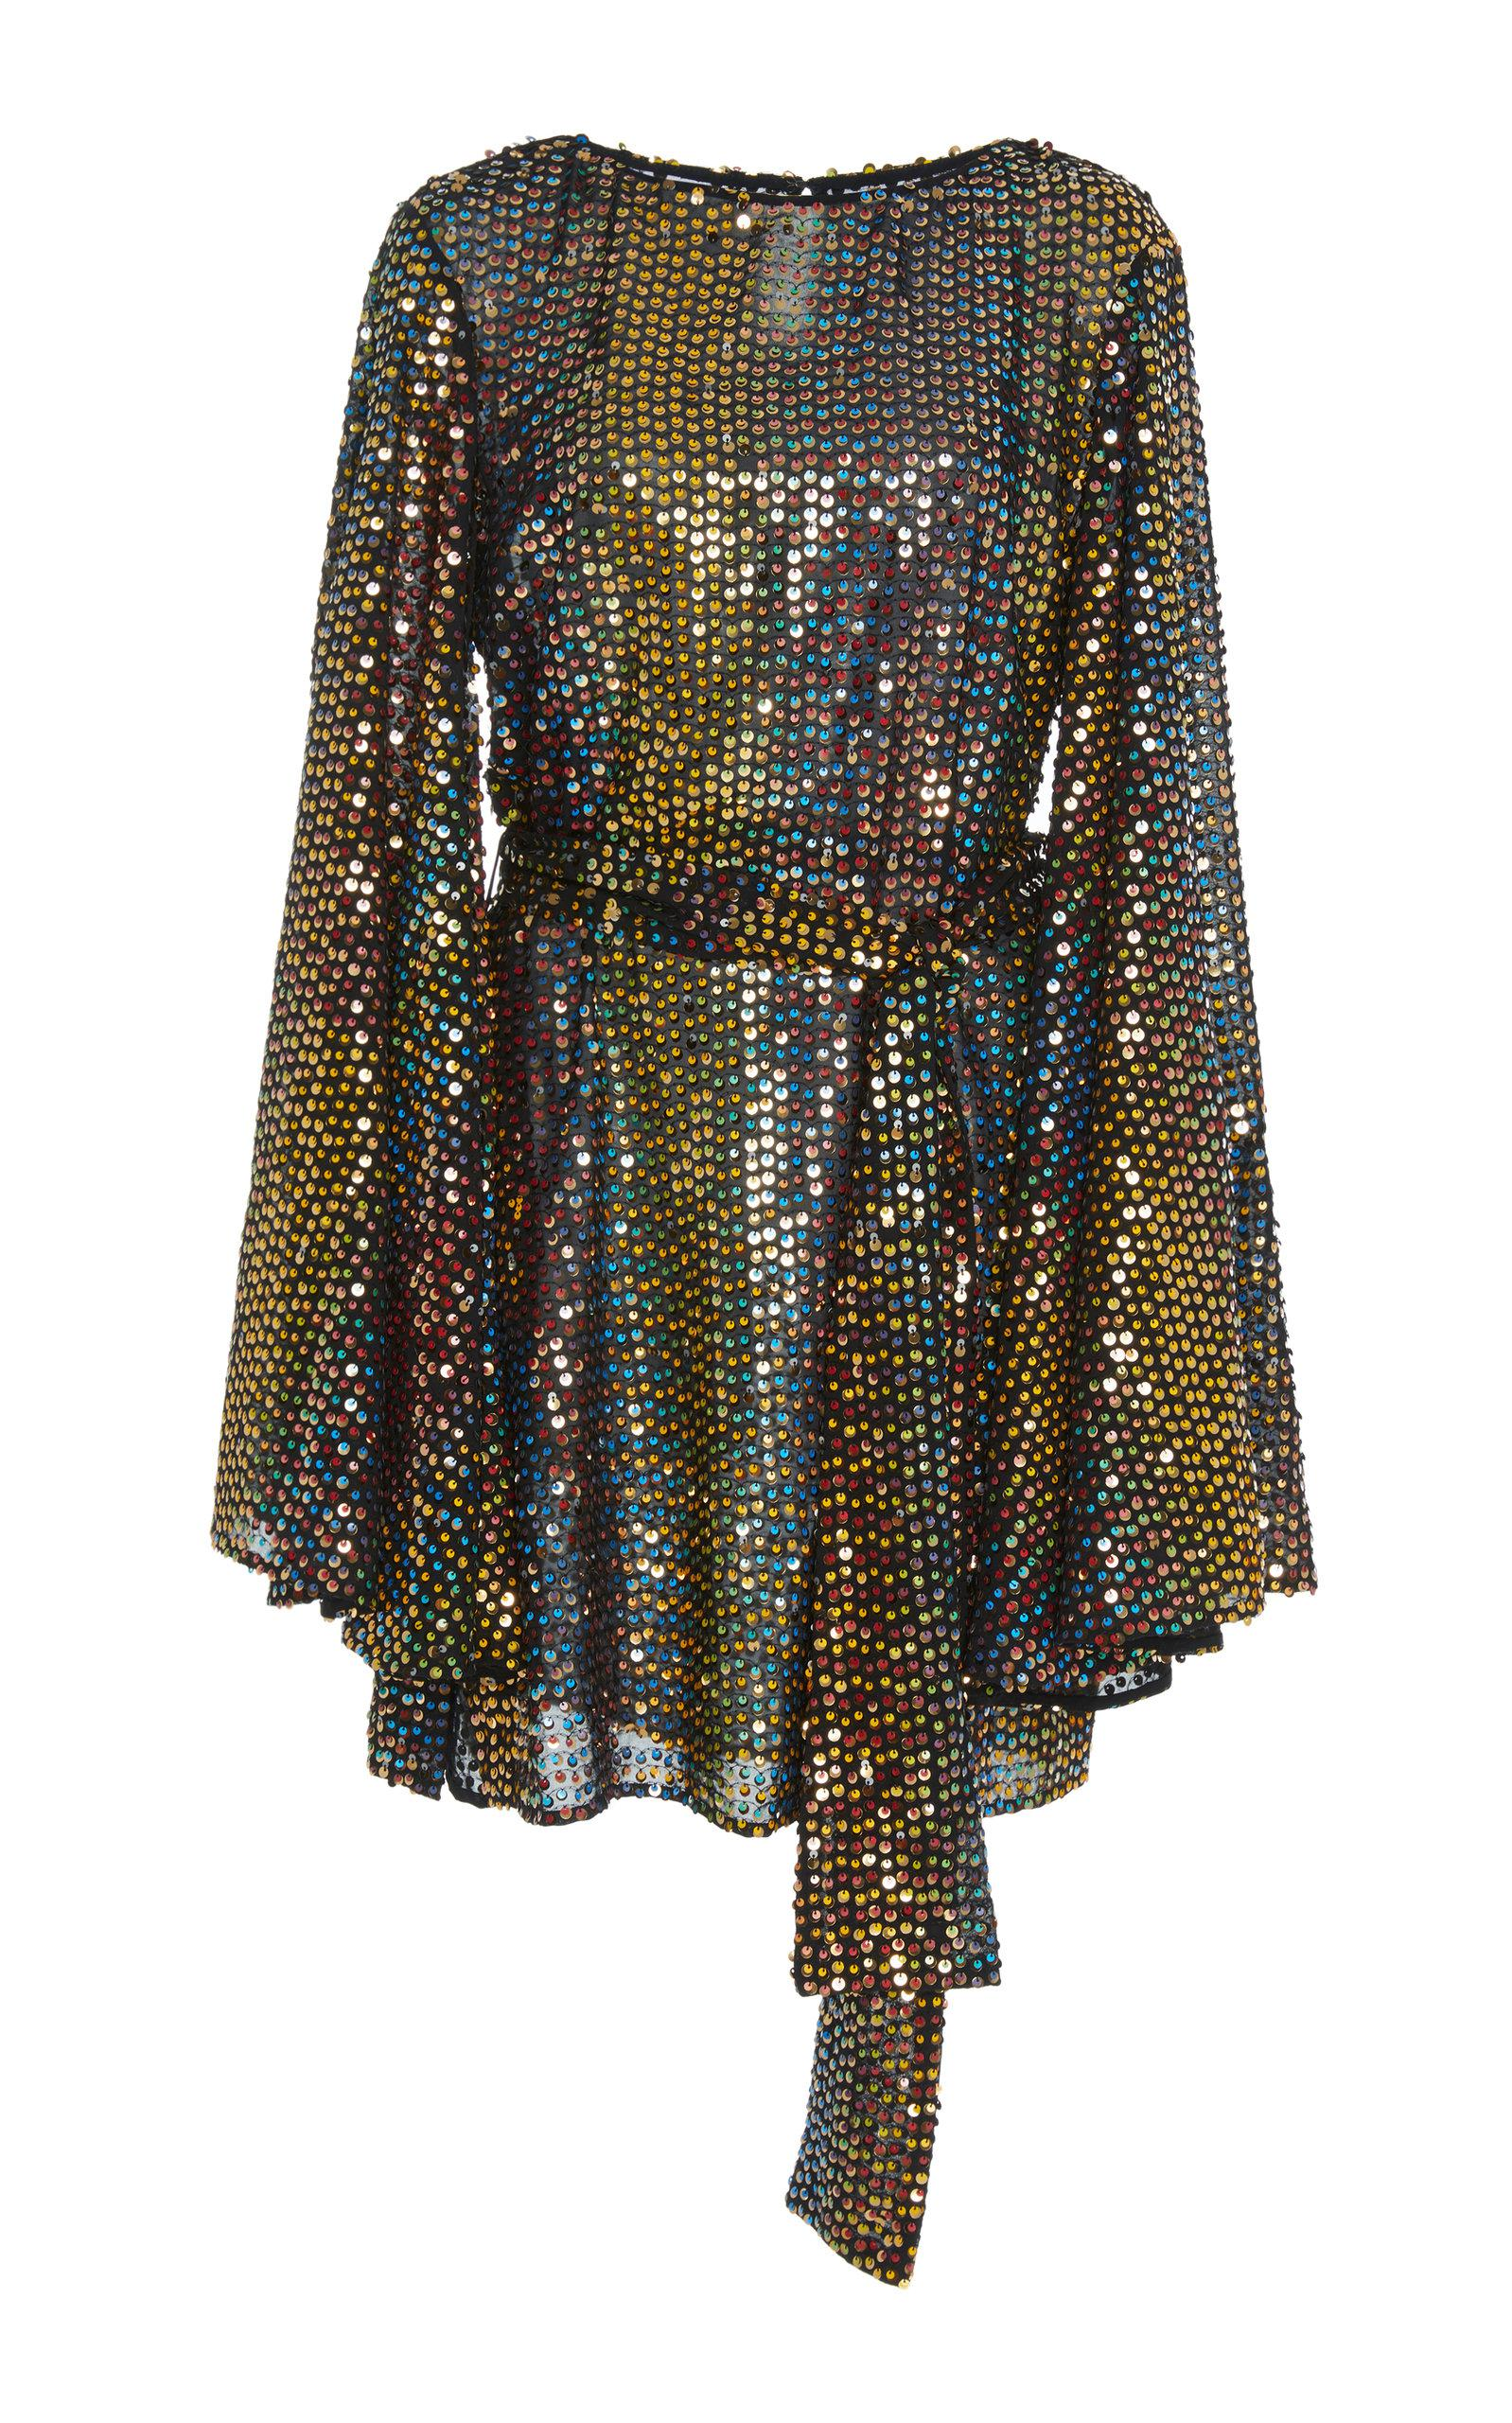 Anya Rainbow Dress Caroline Constas jLIDad